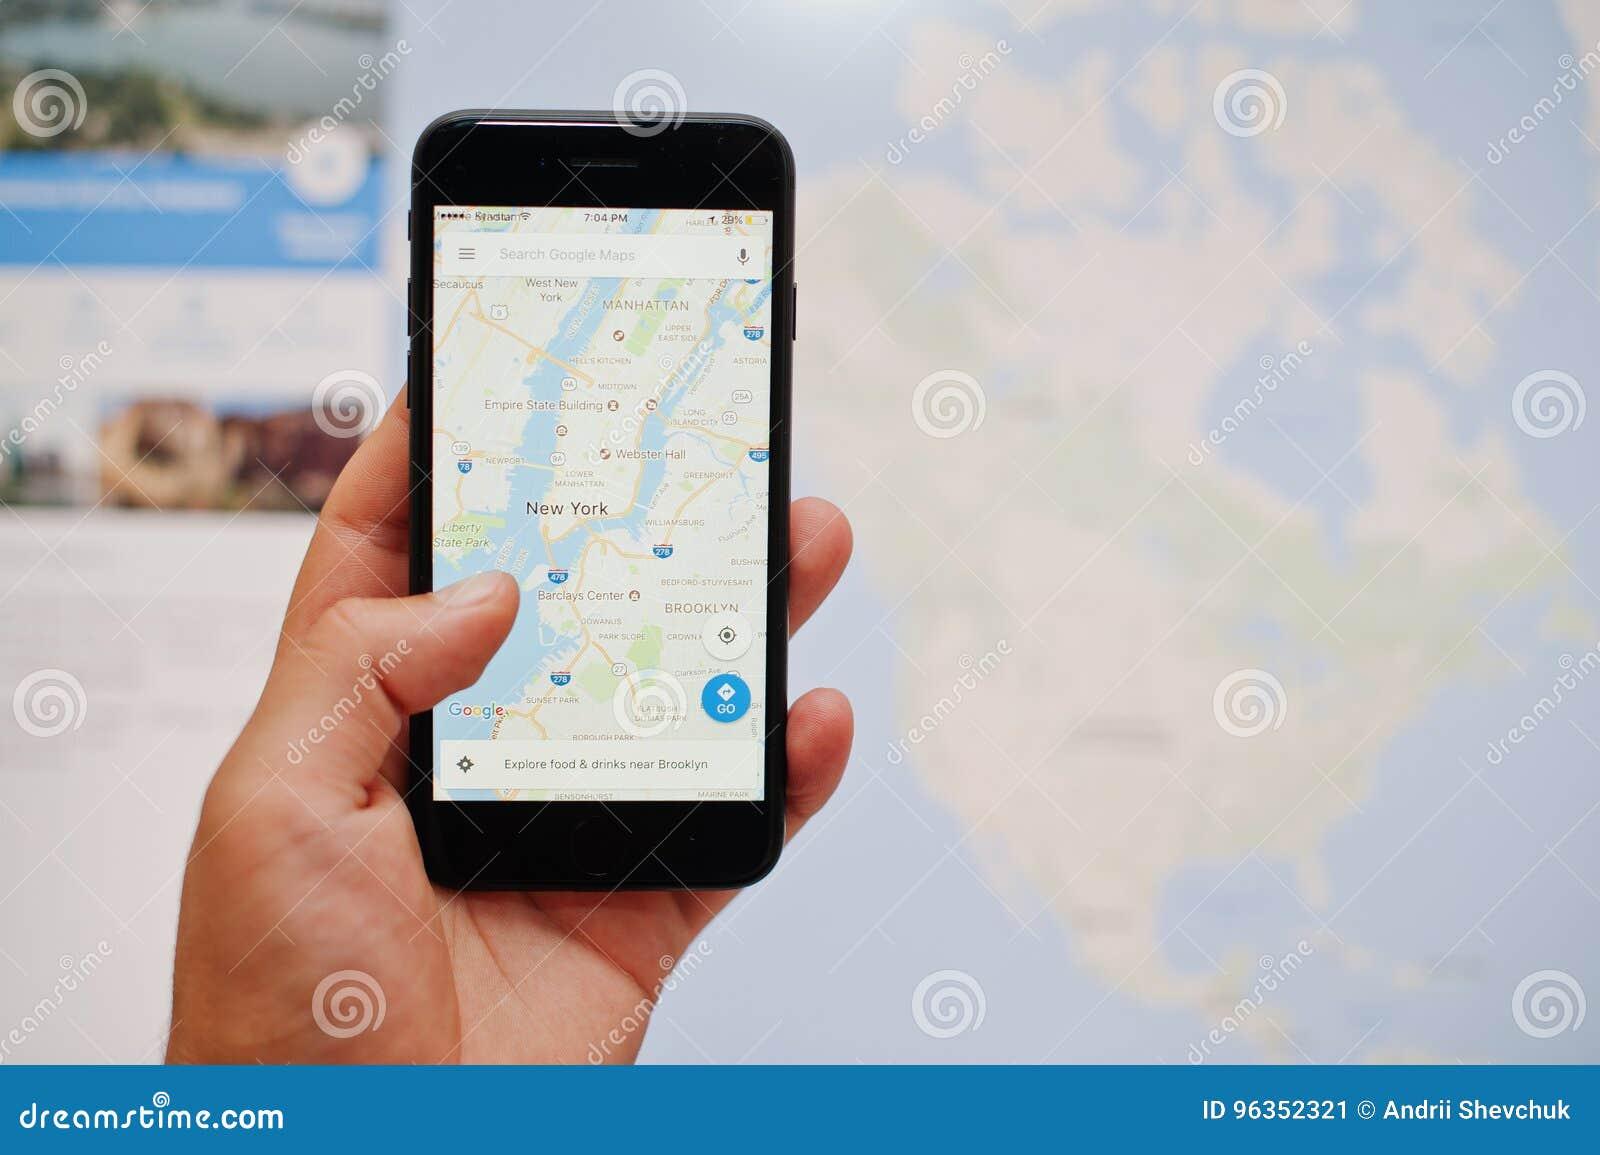 kyiv ukraine jul 11 2017 apple iphone 7 with google maps app